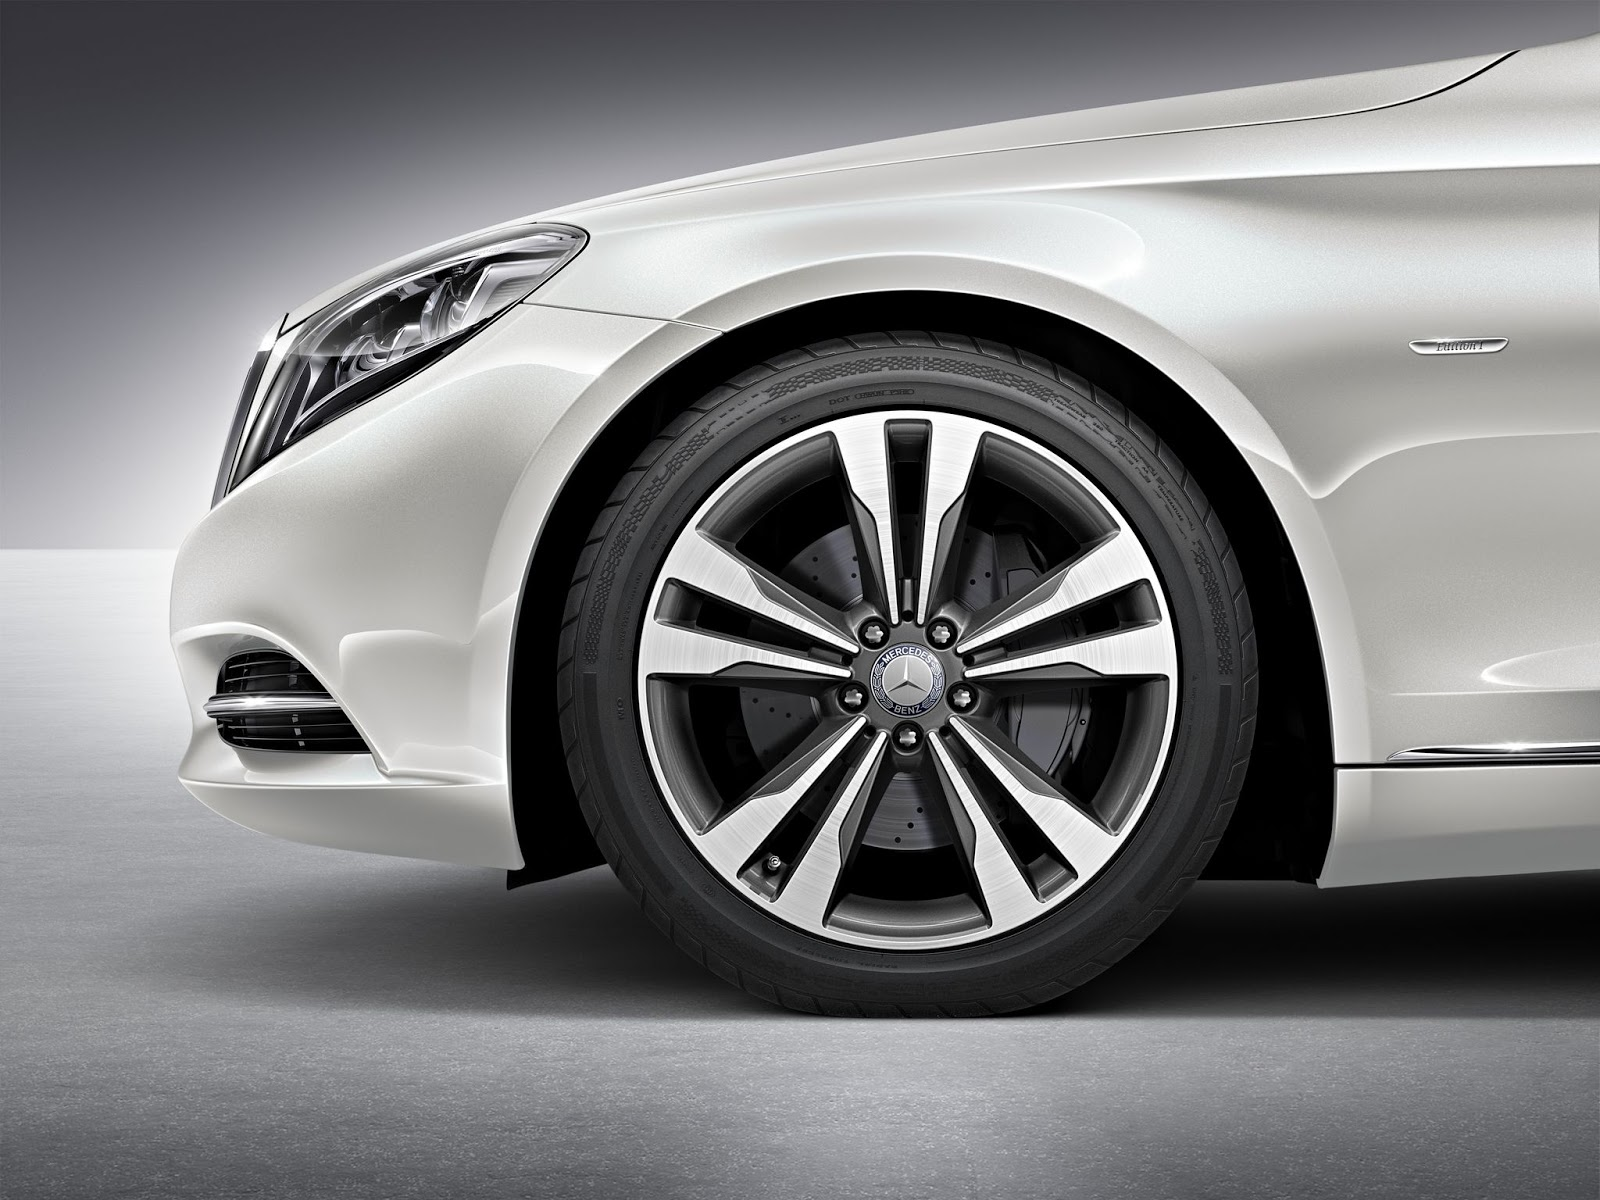 Read more here News in German Mercedes Benz W222 S Klasse Edition 1